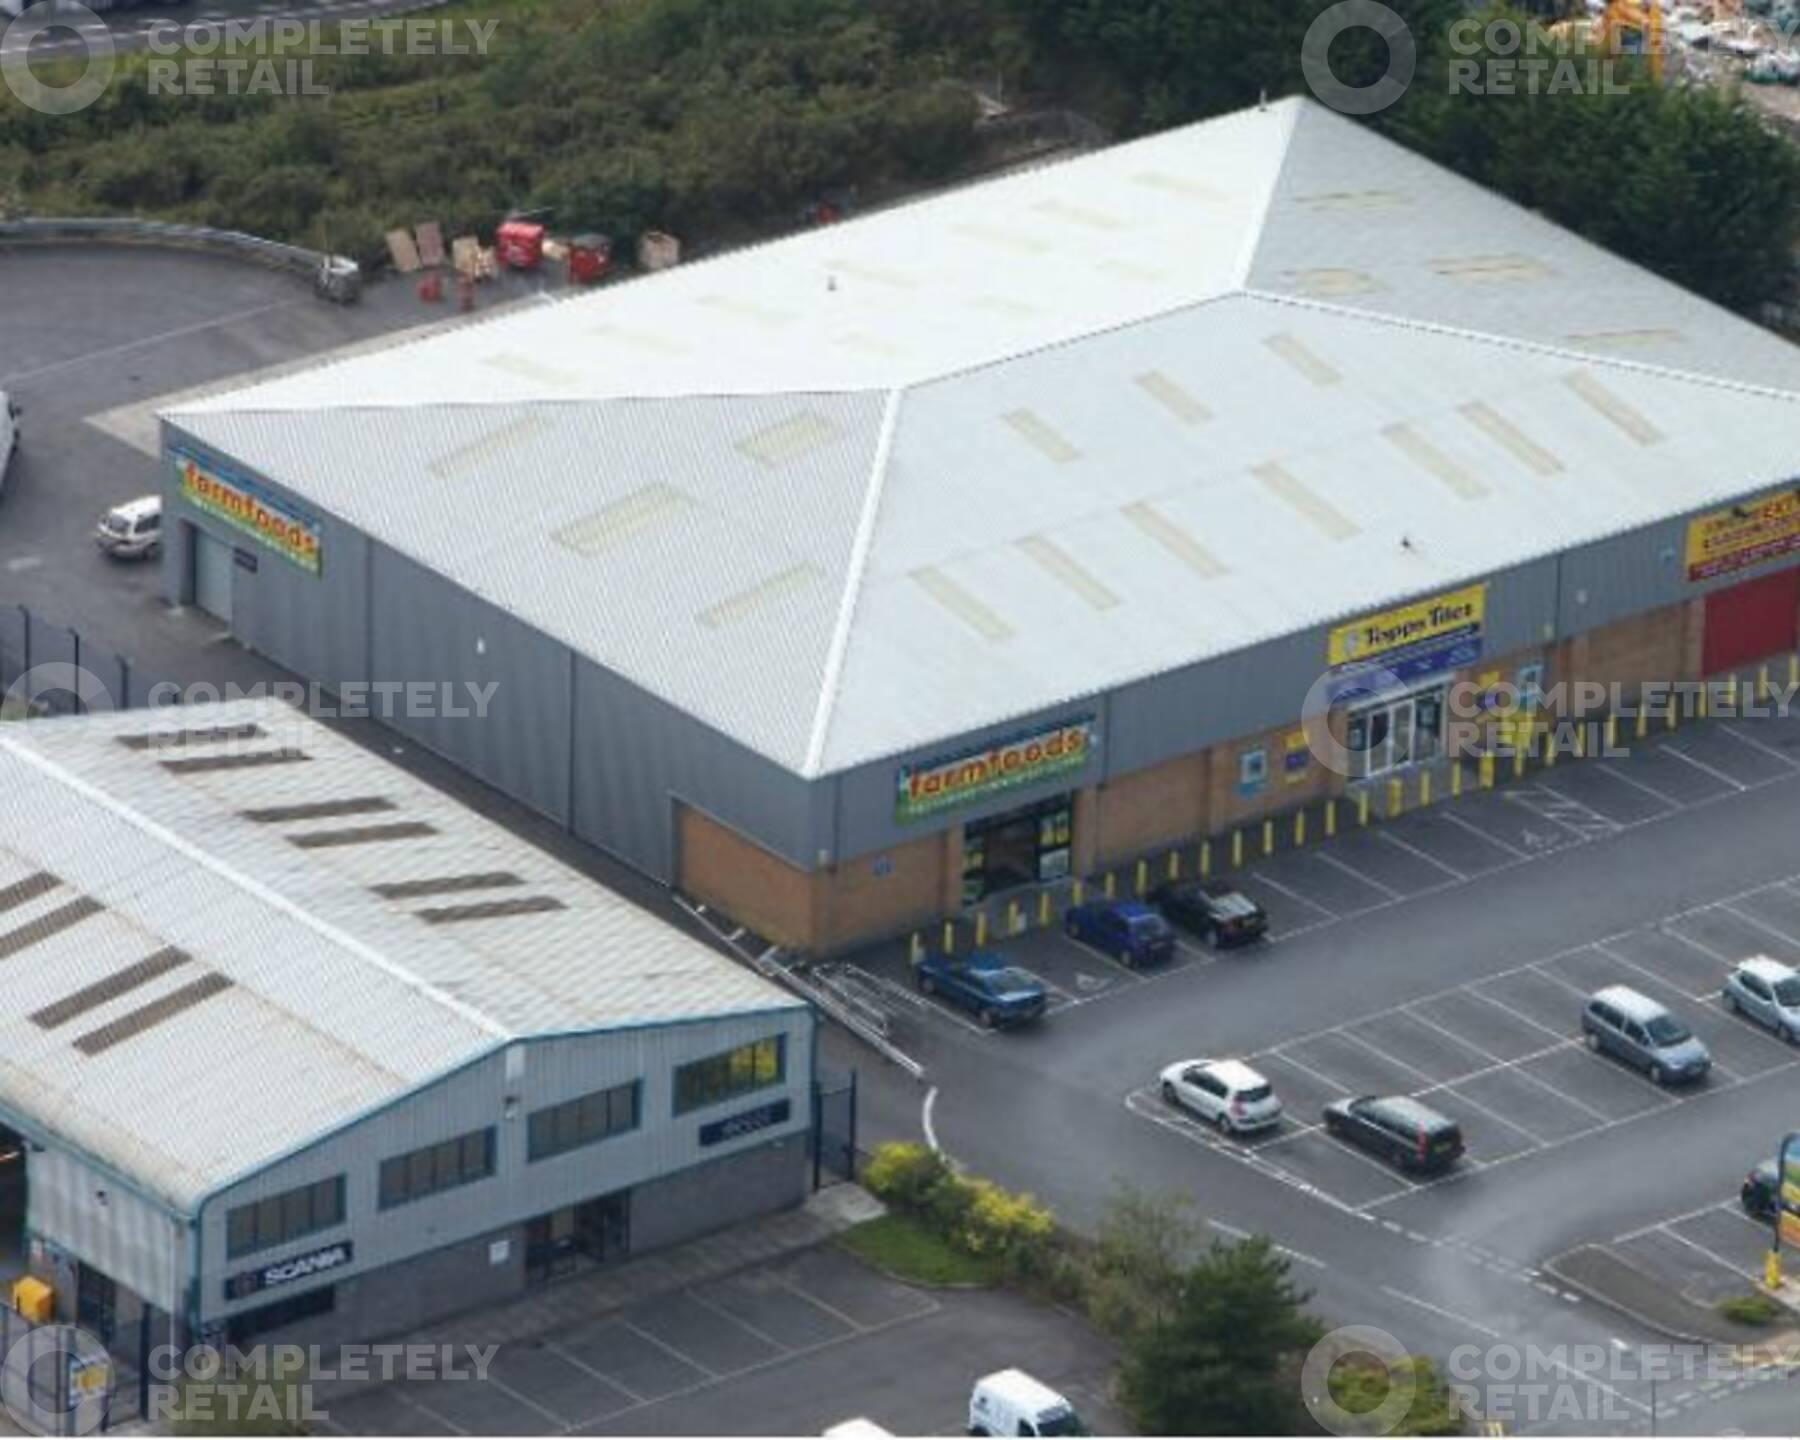 Cross Hands Retail Park